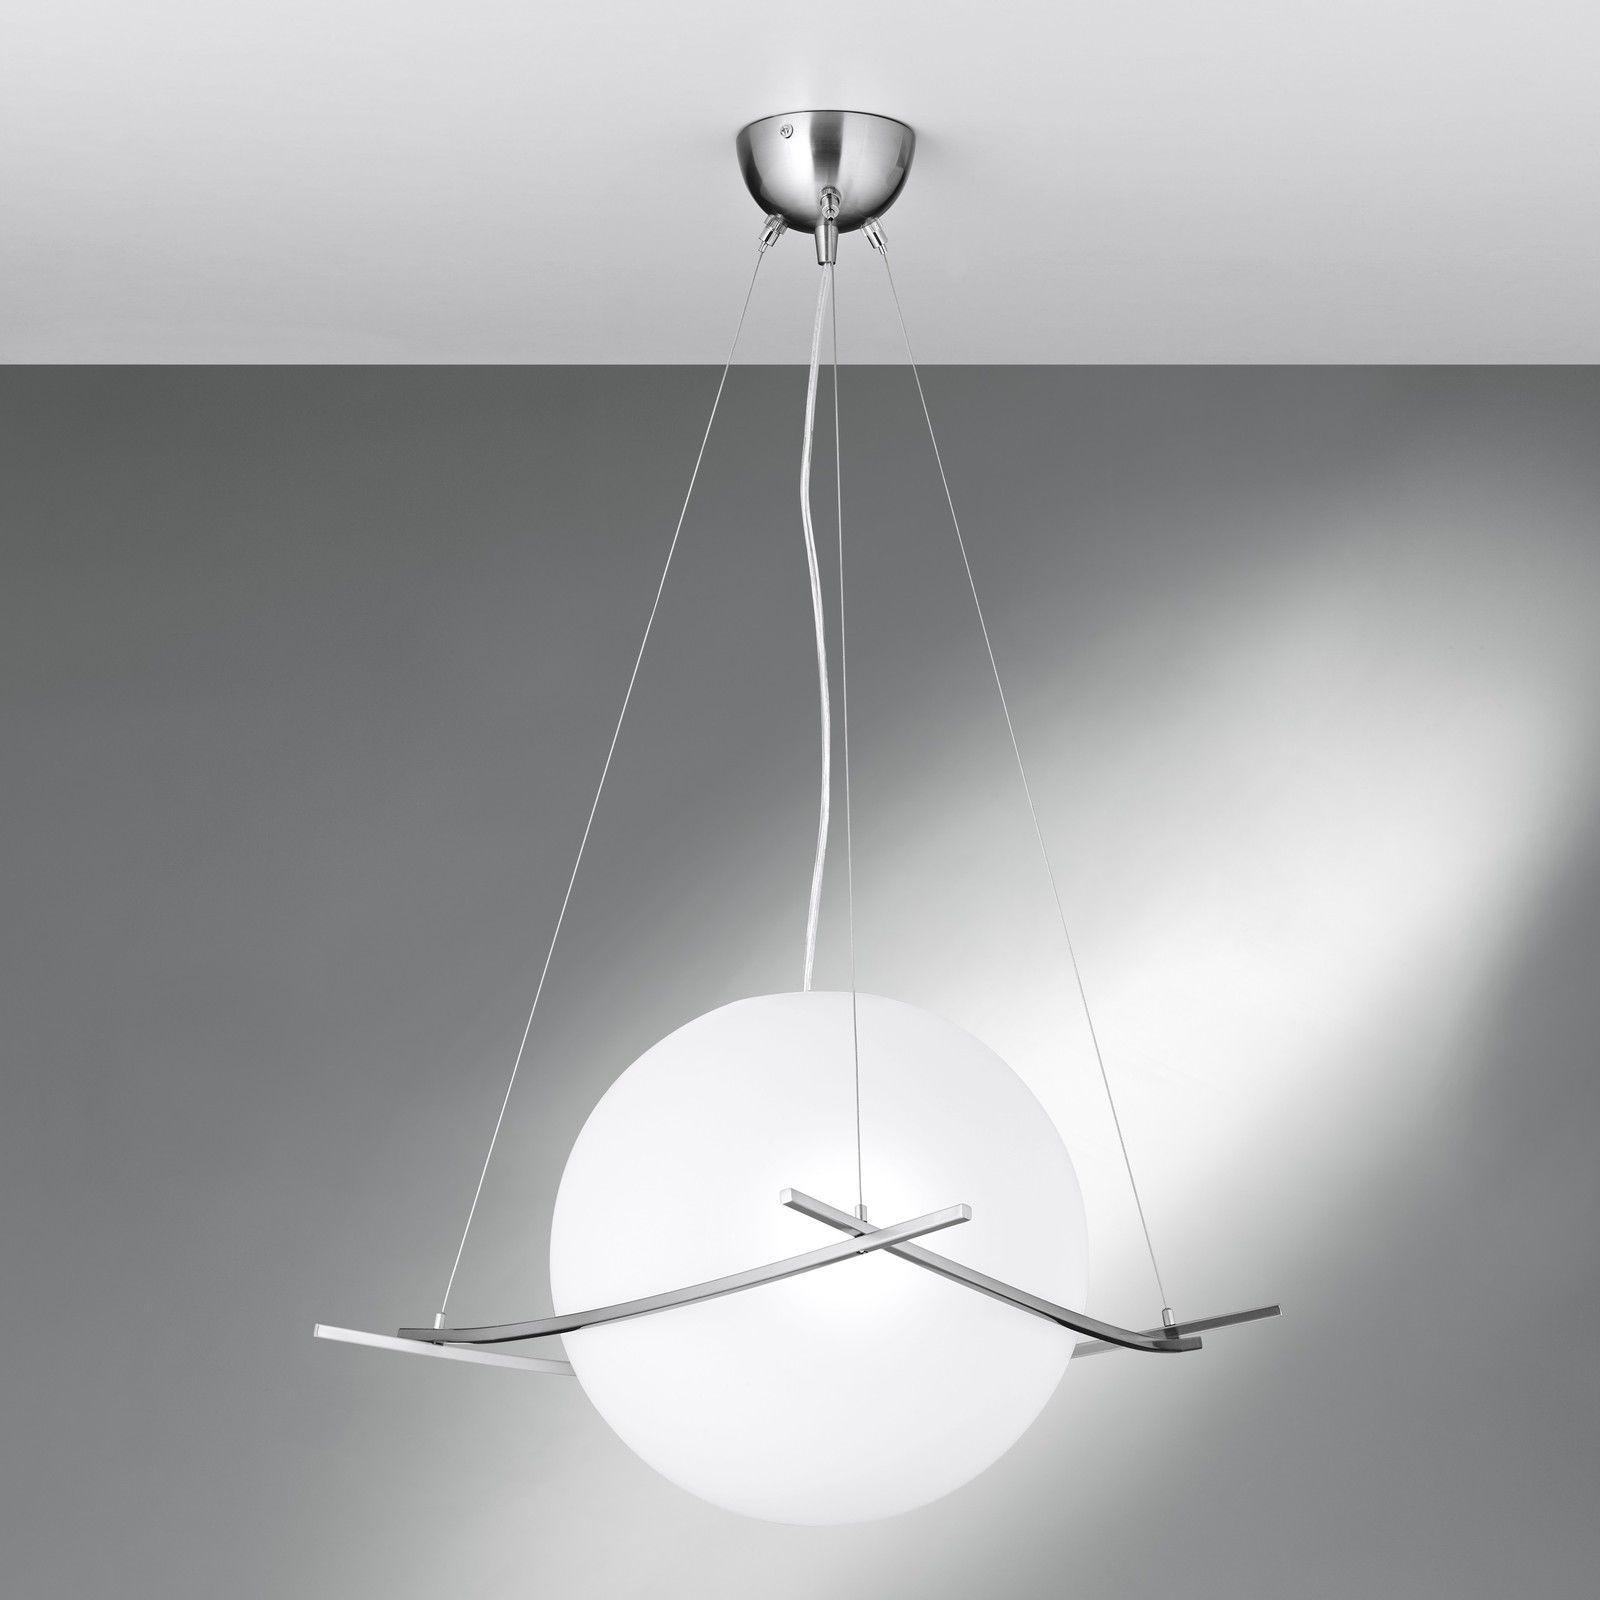 Neg Hangeleuchte Unopalloni Pendelleuchte Hangelampe Lampe Opal Glas